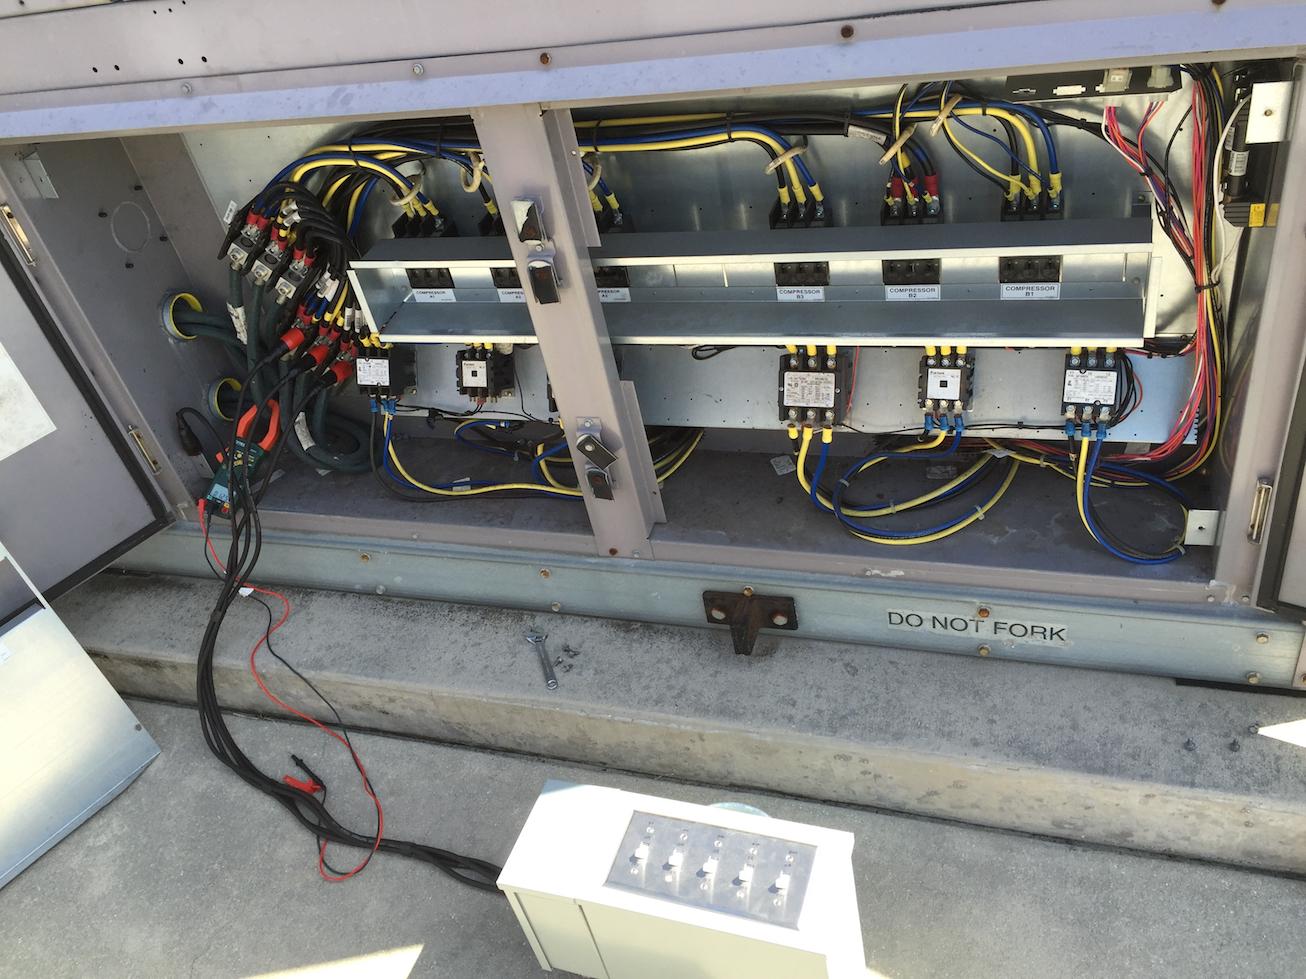 power factor correction equipment testing tool